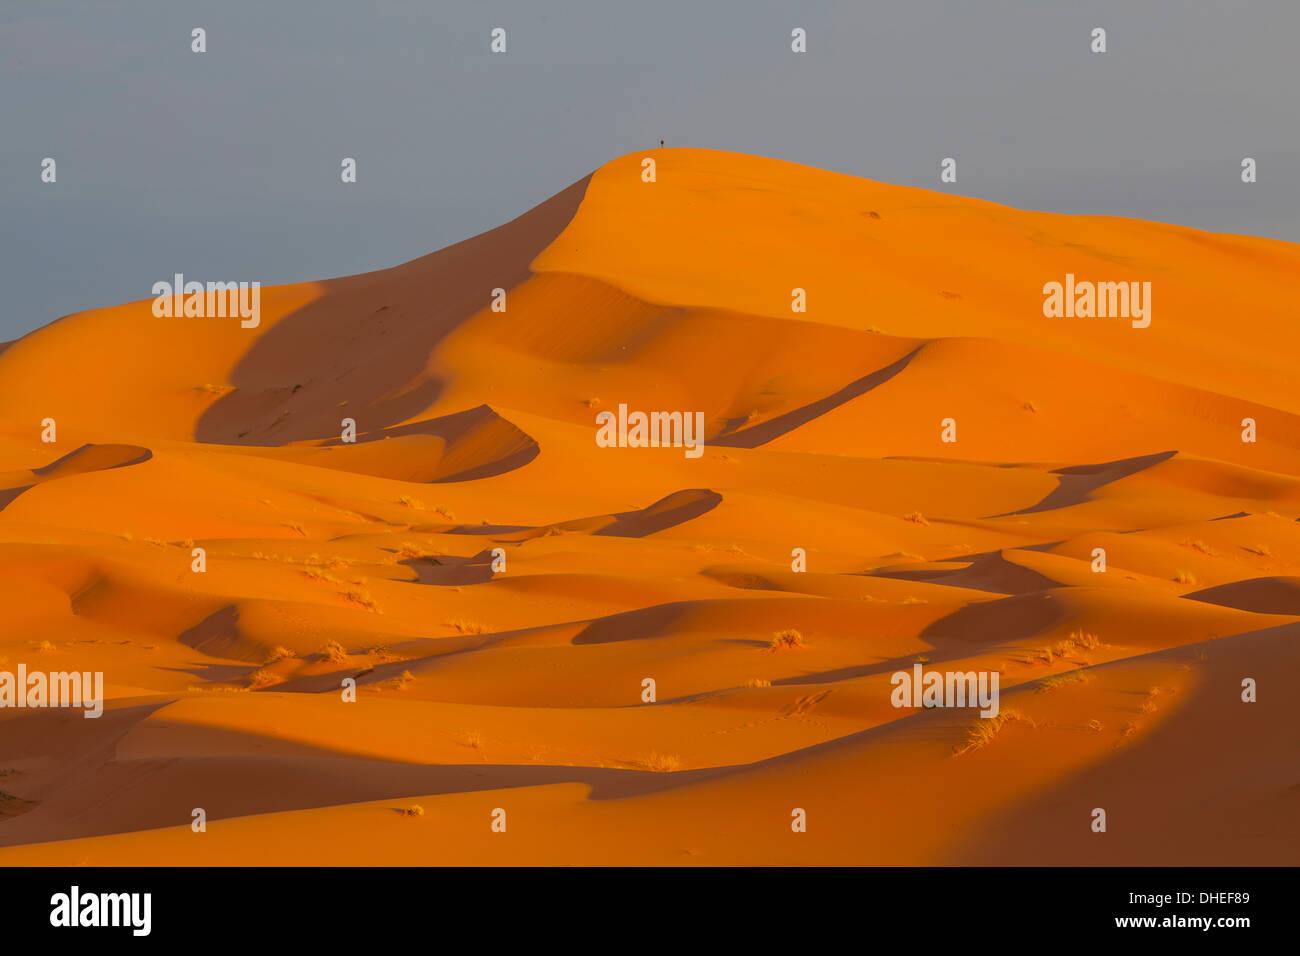 Sand dunes, Sahara Desert, Merzouga, Morocco, North Africa, Africa - Stock Image